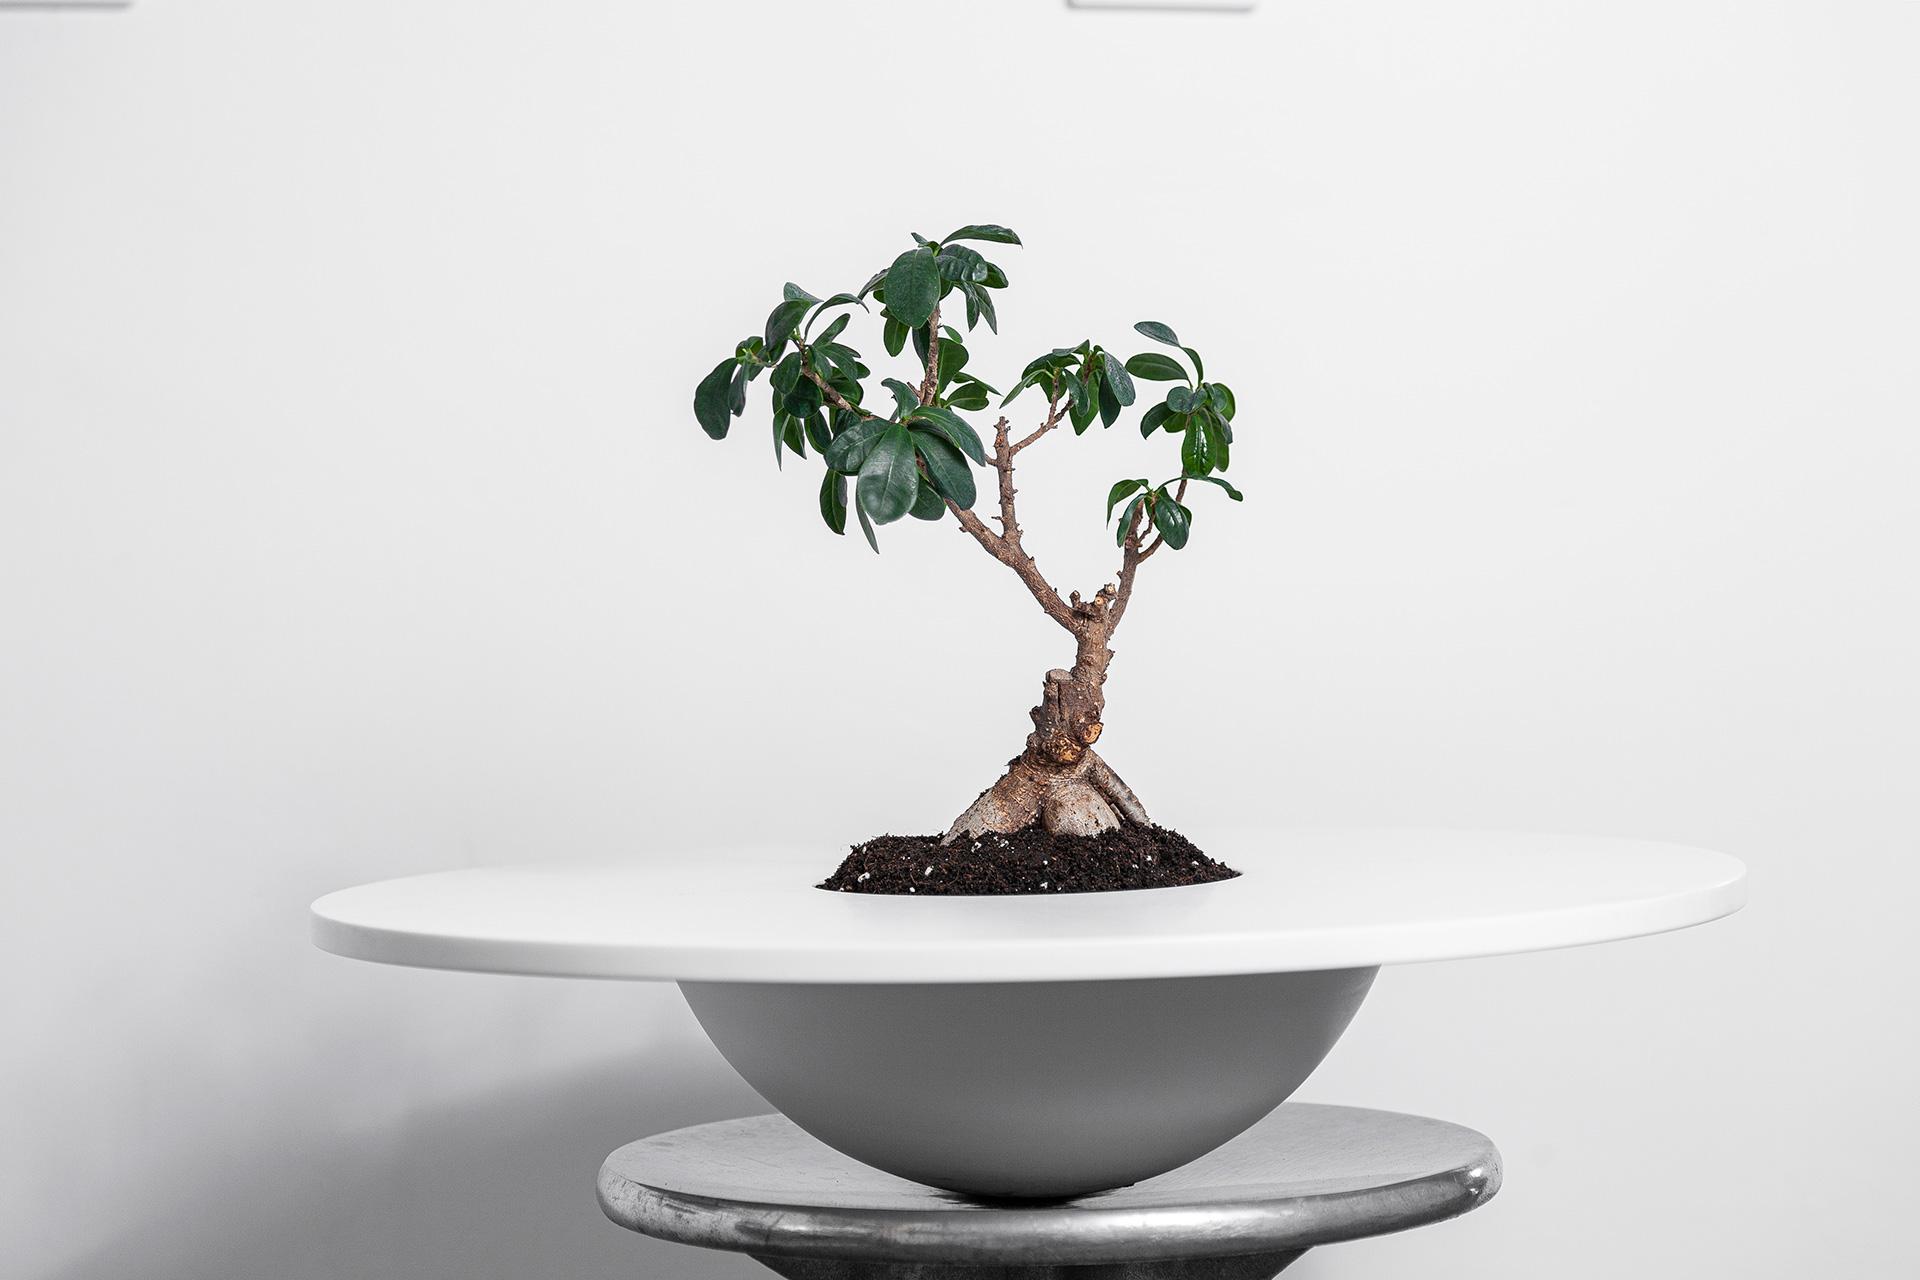 Hat Vase Tree - DESIGN BY MIGUEL SOEIRO